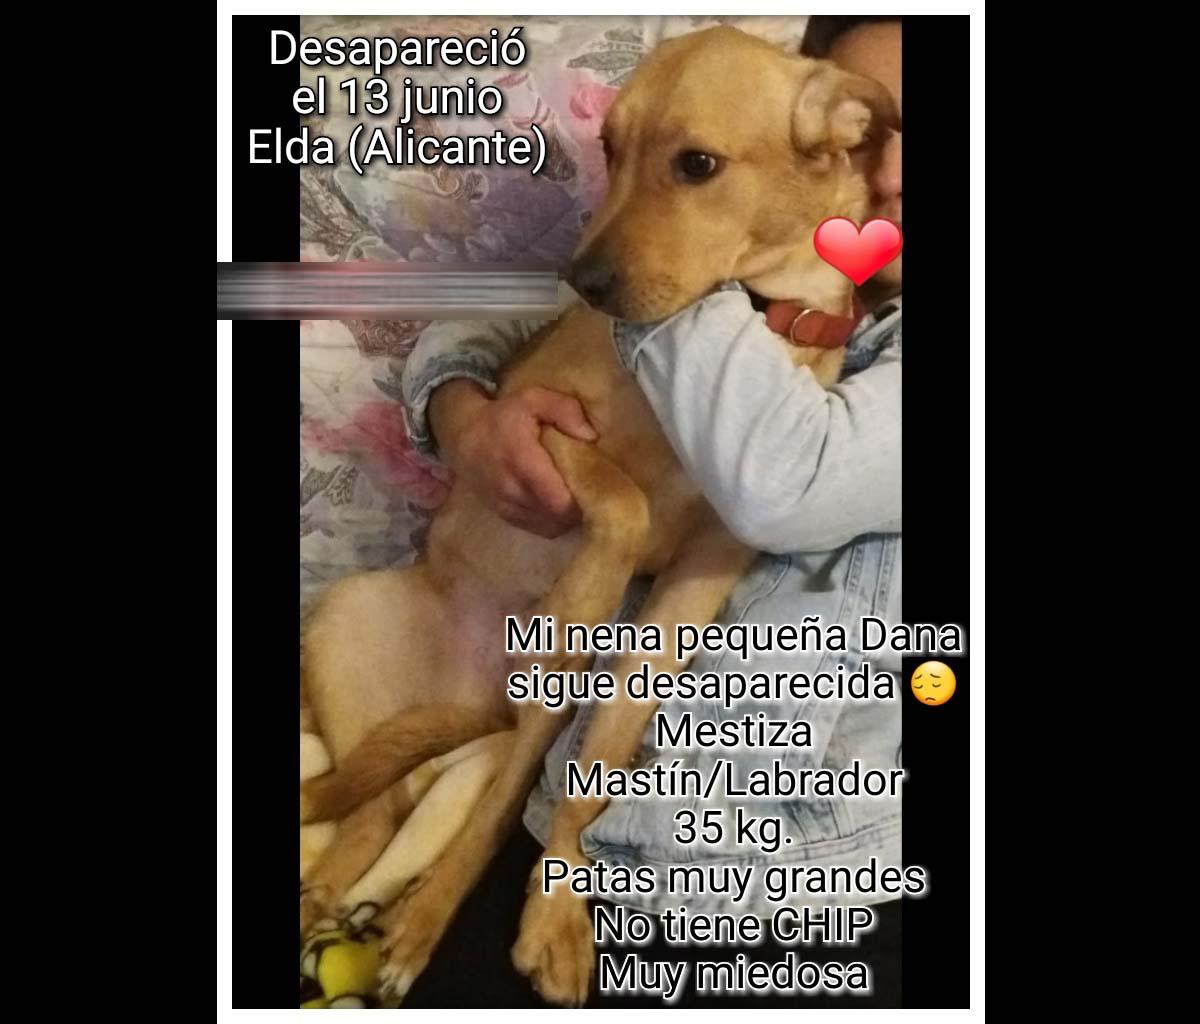 Perro perdido MESTIZO - DESCONOZCO LA RAZA en Elda (Alicante)